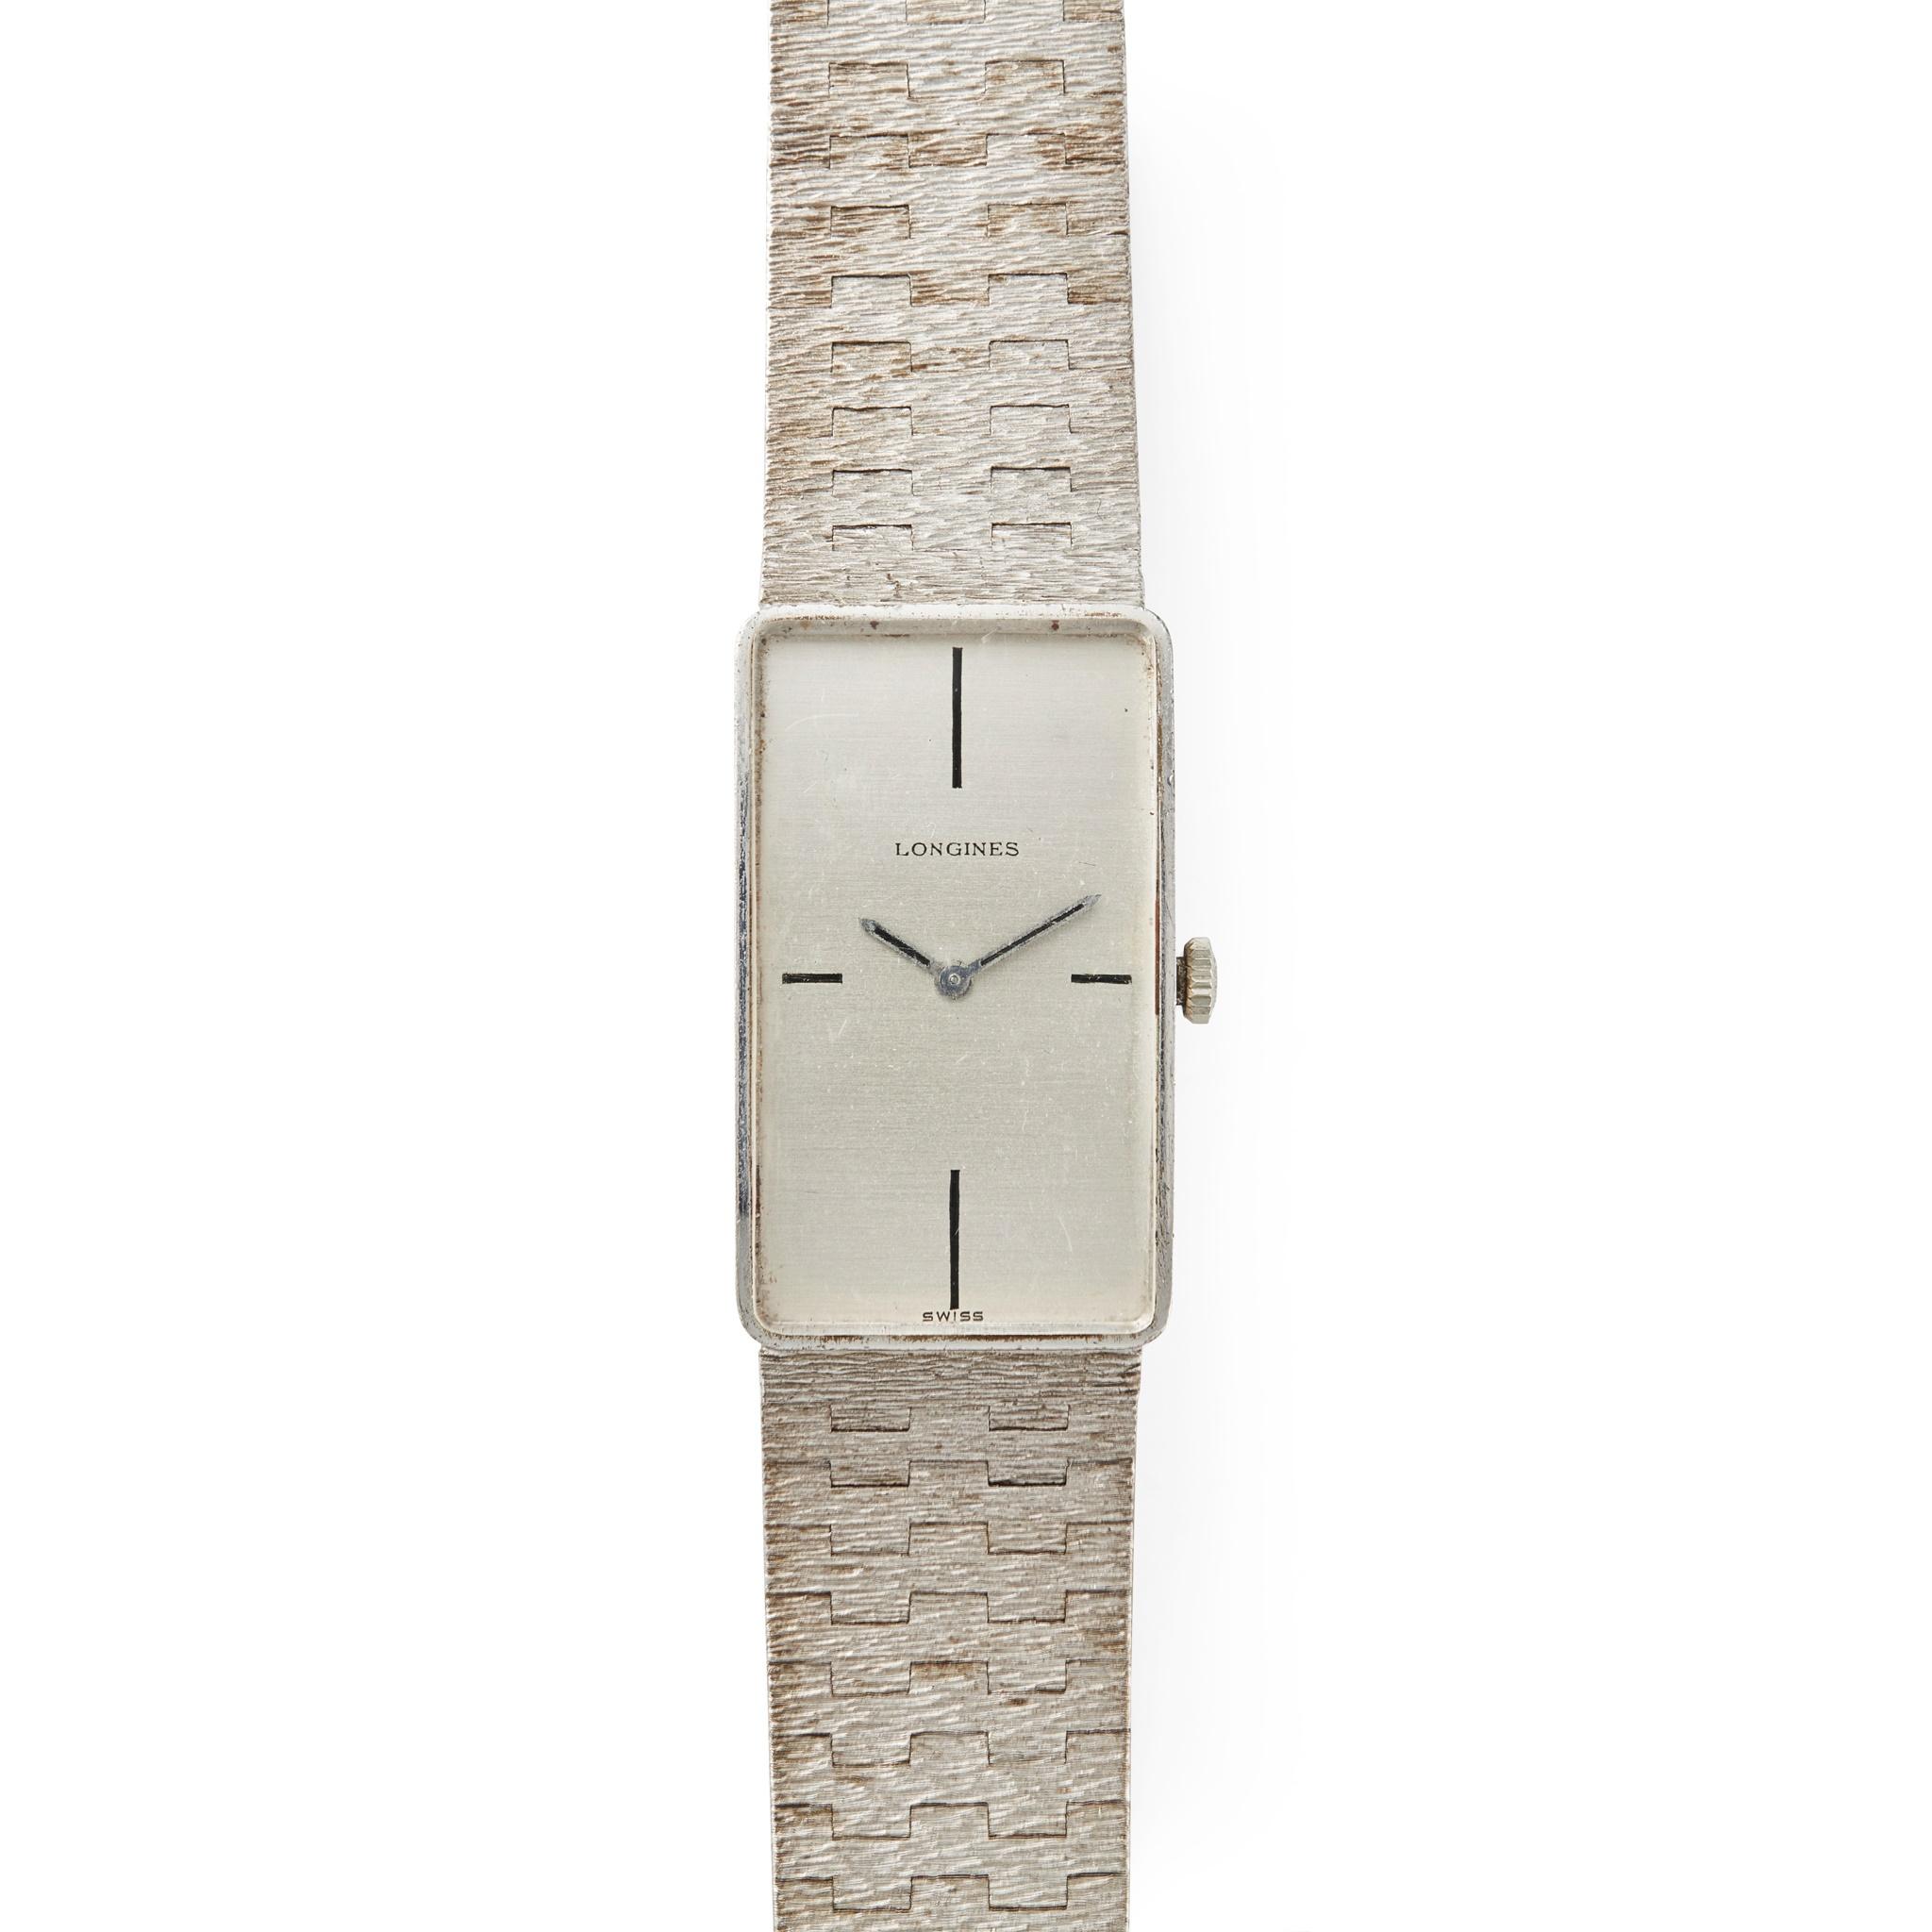 Longines: a gentleman's silver wrist watch